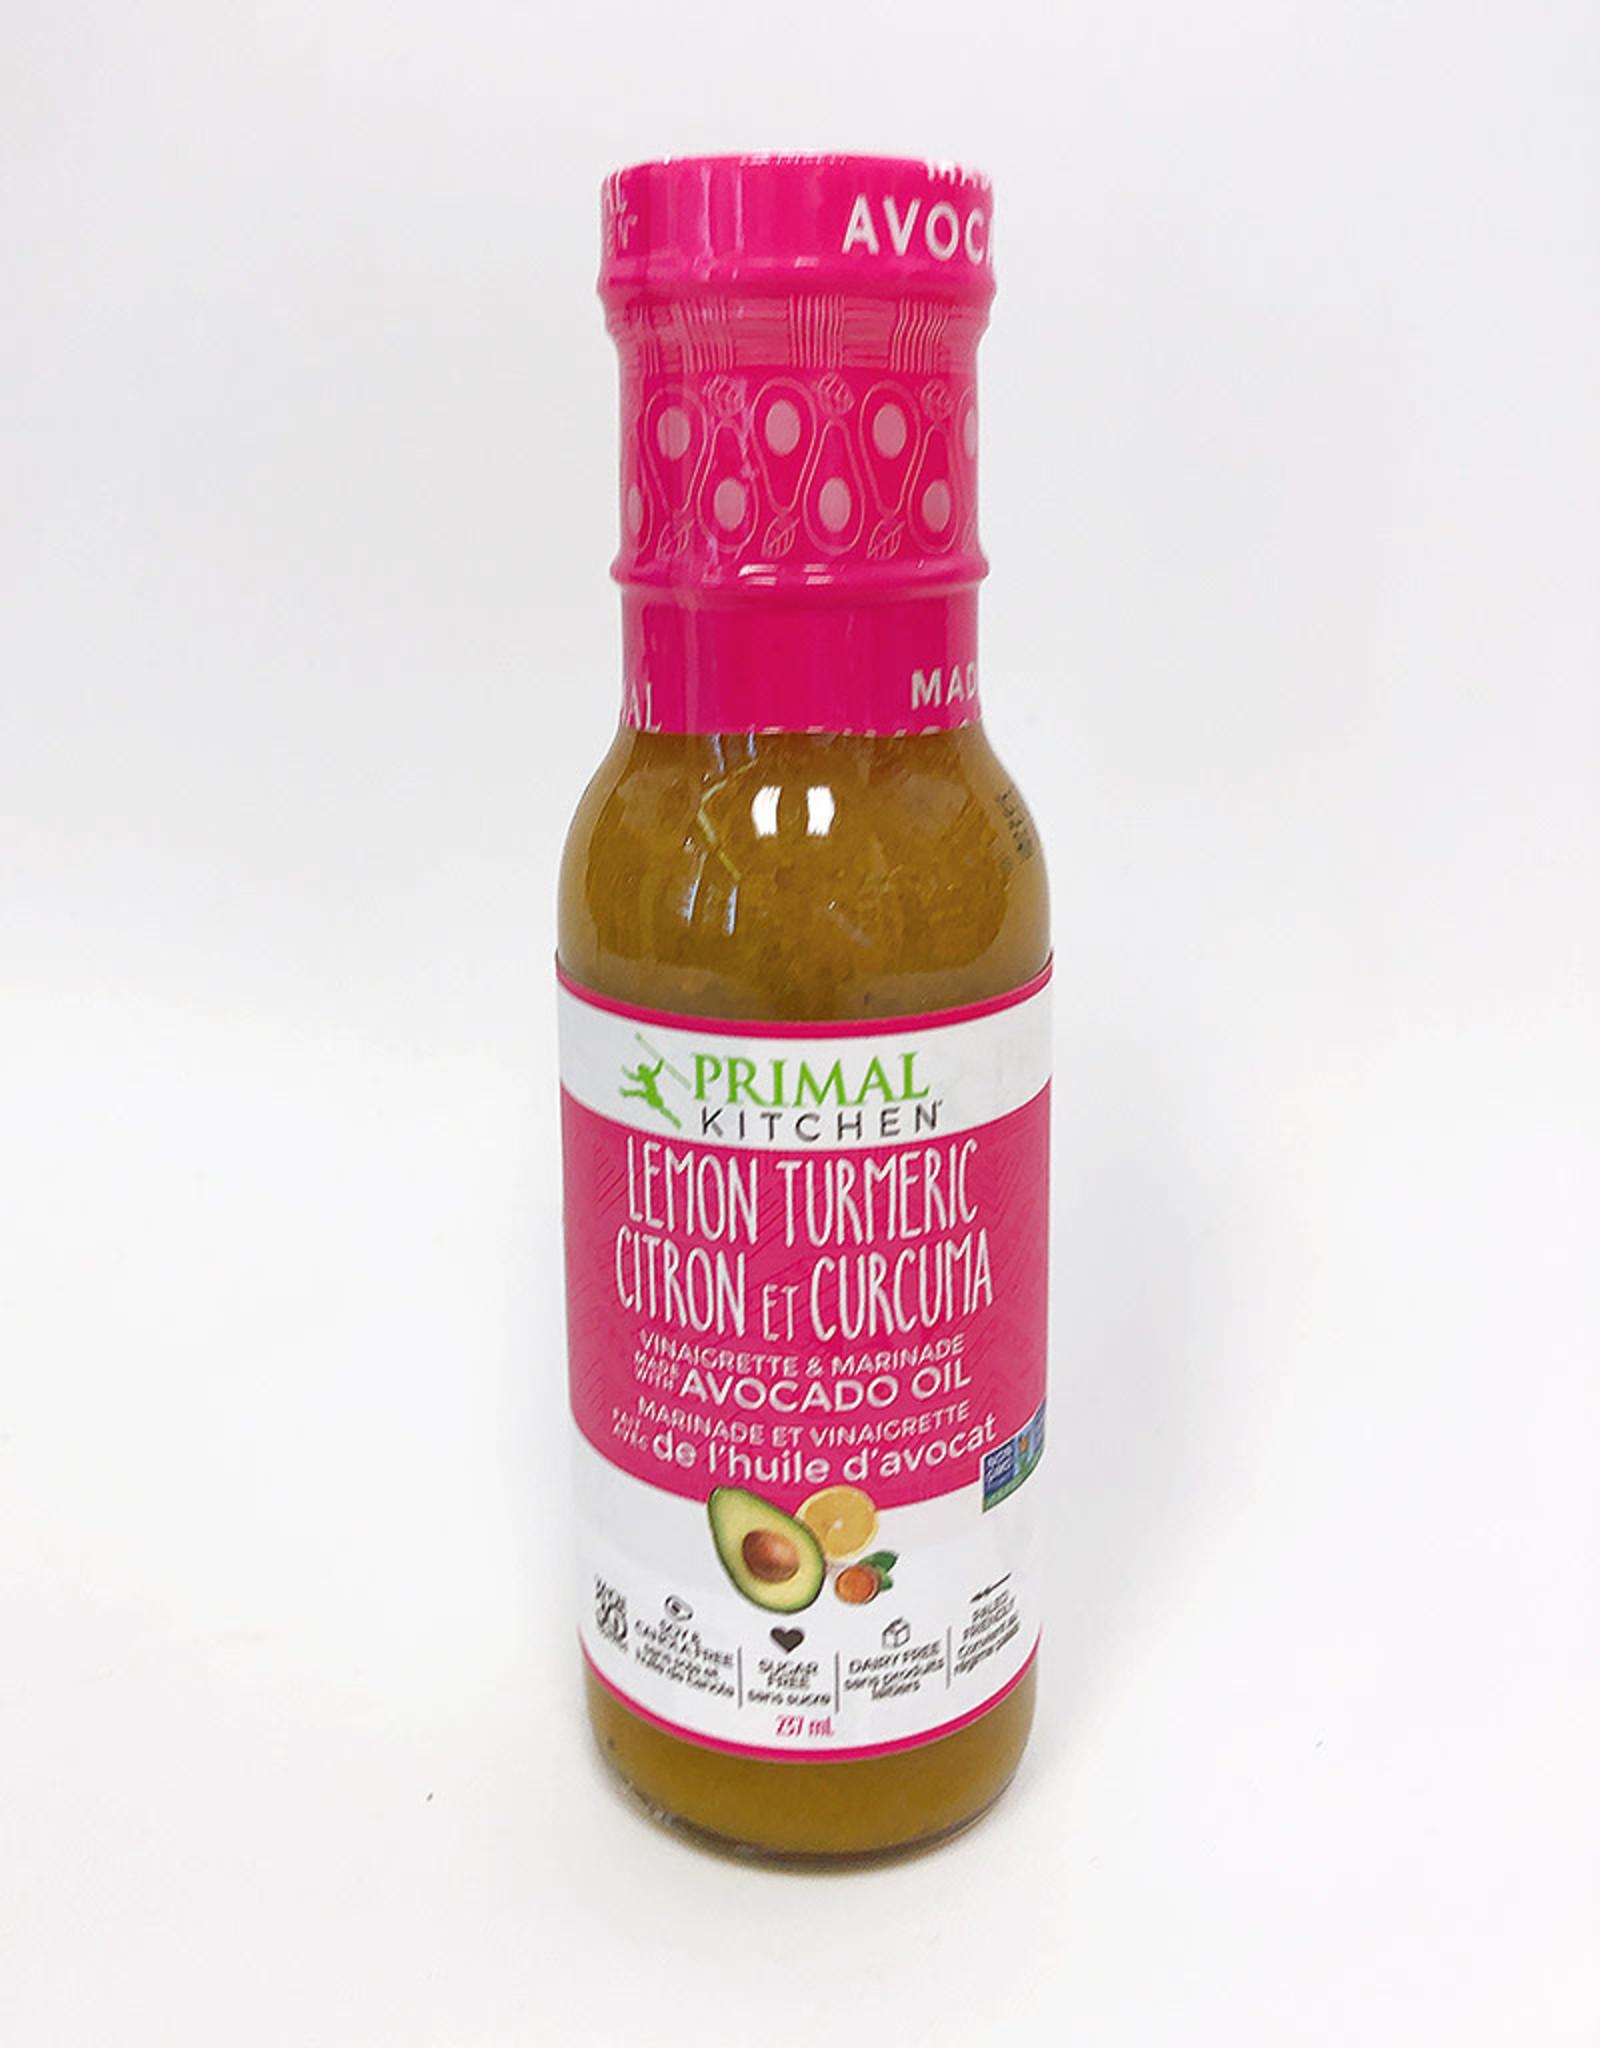 Primal Kitchen Primal Kitchen - Dressing, Lemon Turmeric Vinaigrette (237ml)